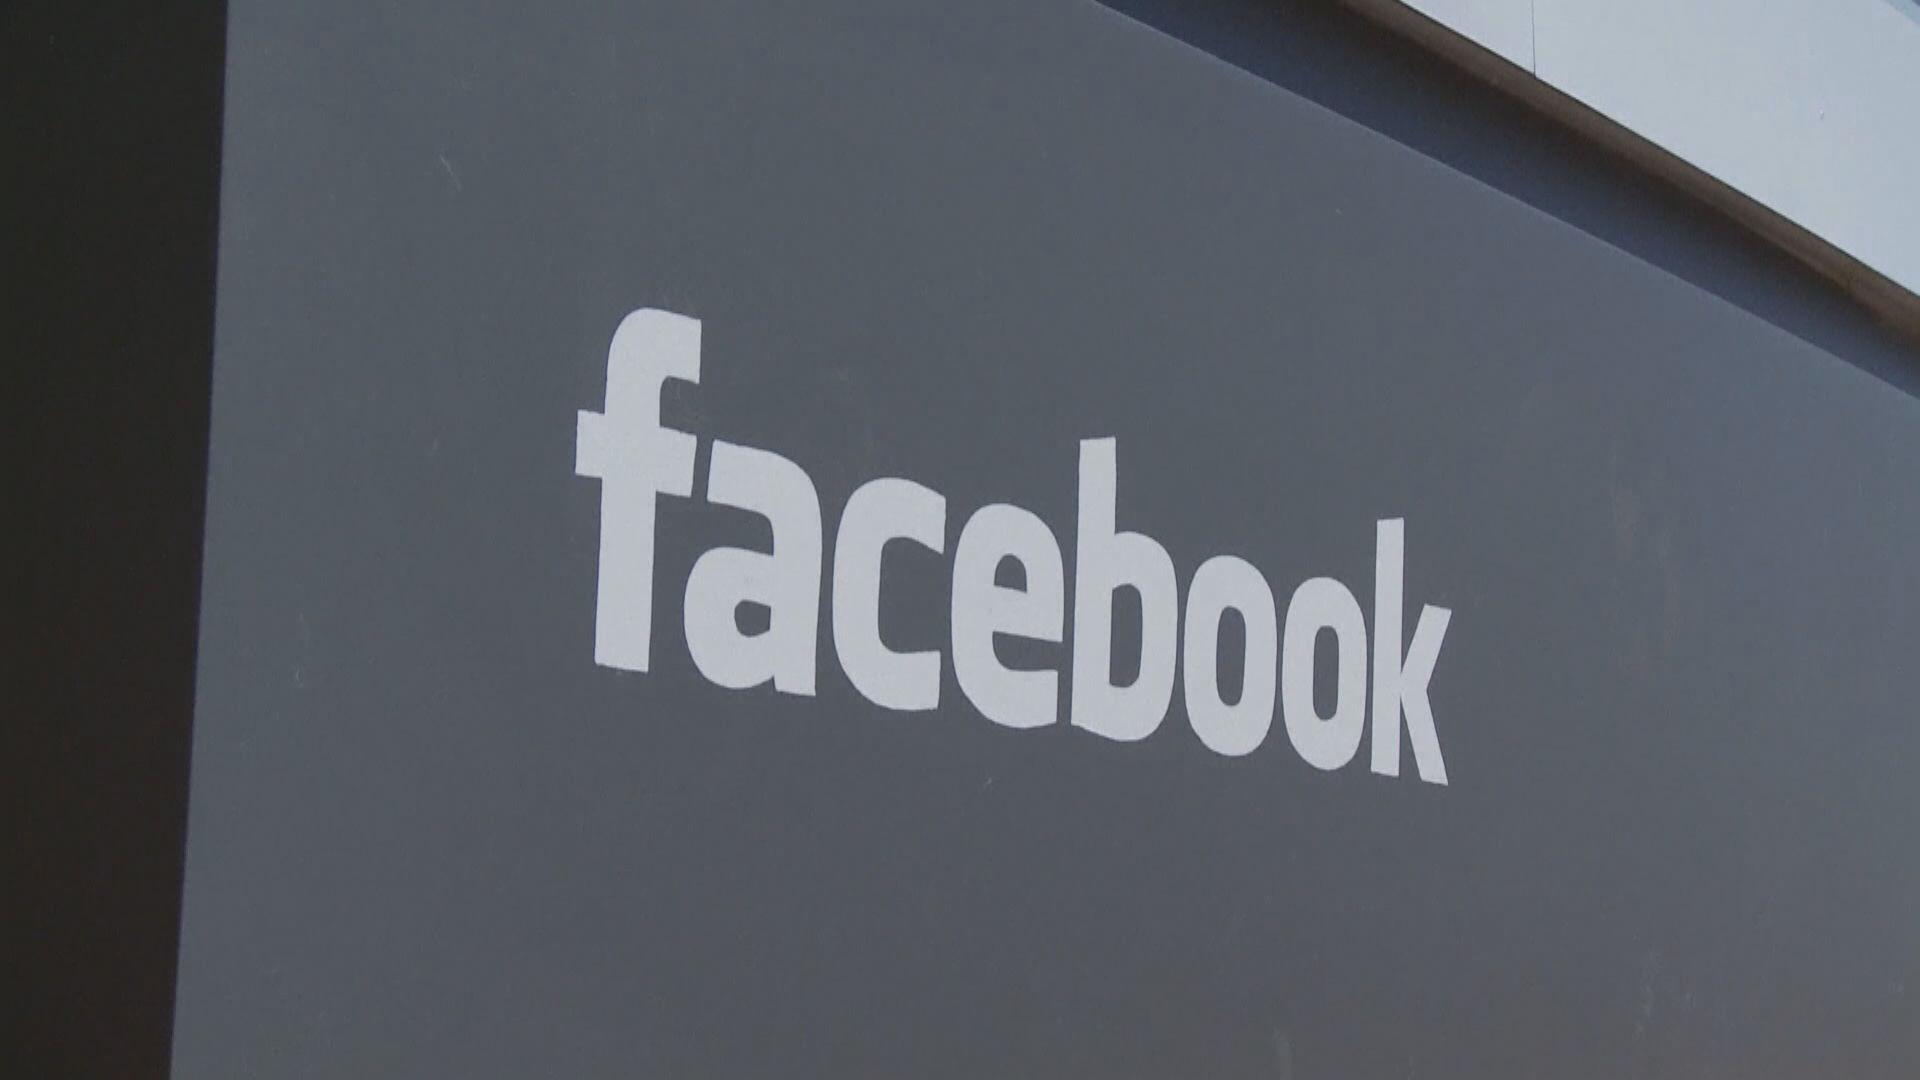 Facebook:蘋果iOS14將削弱網絡廣告業務